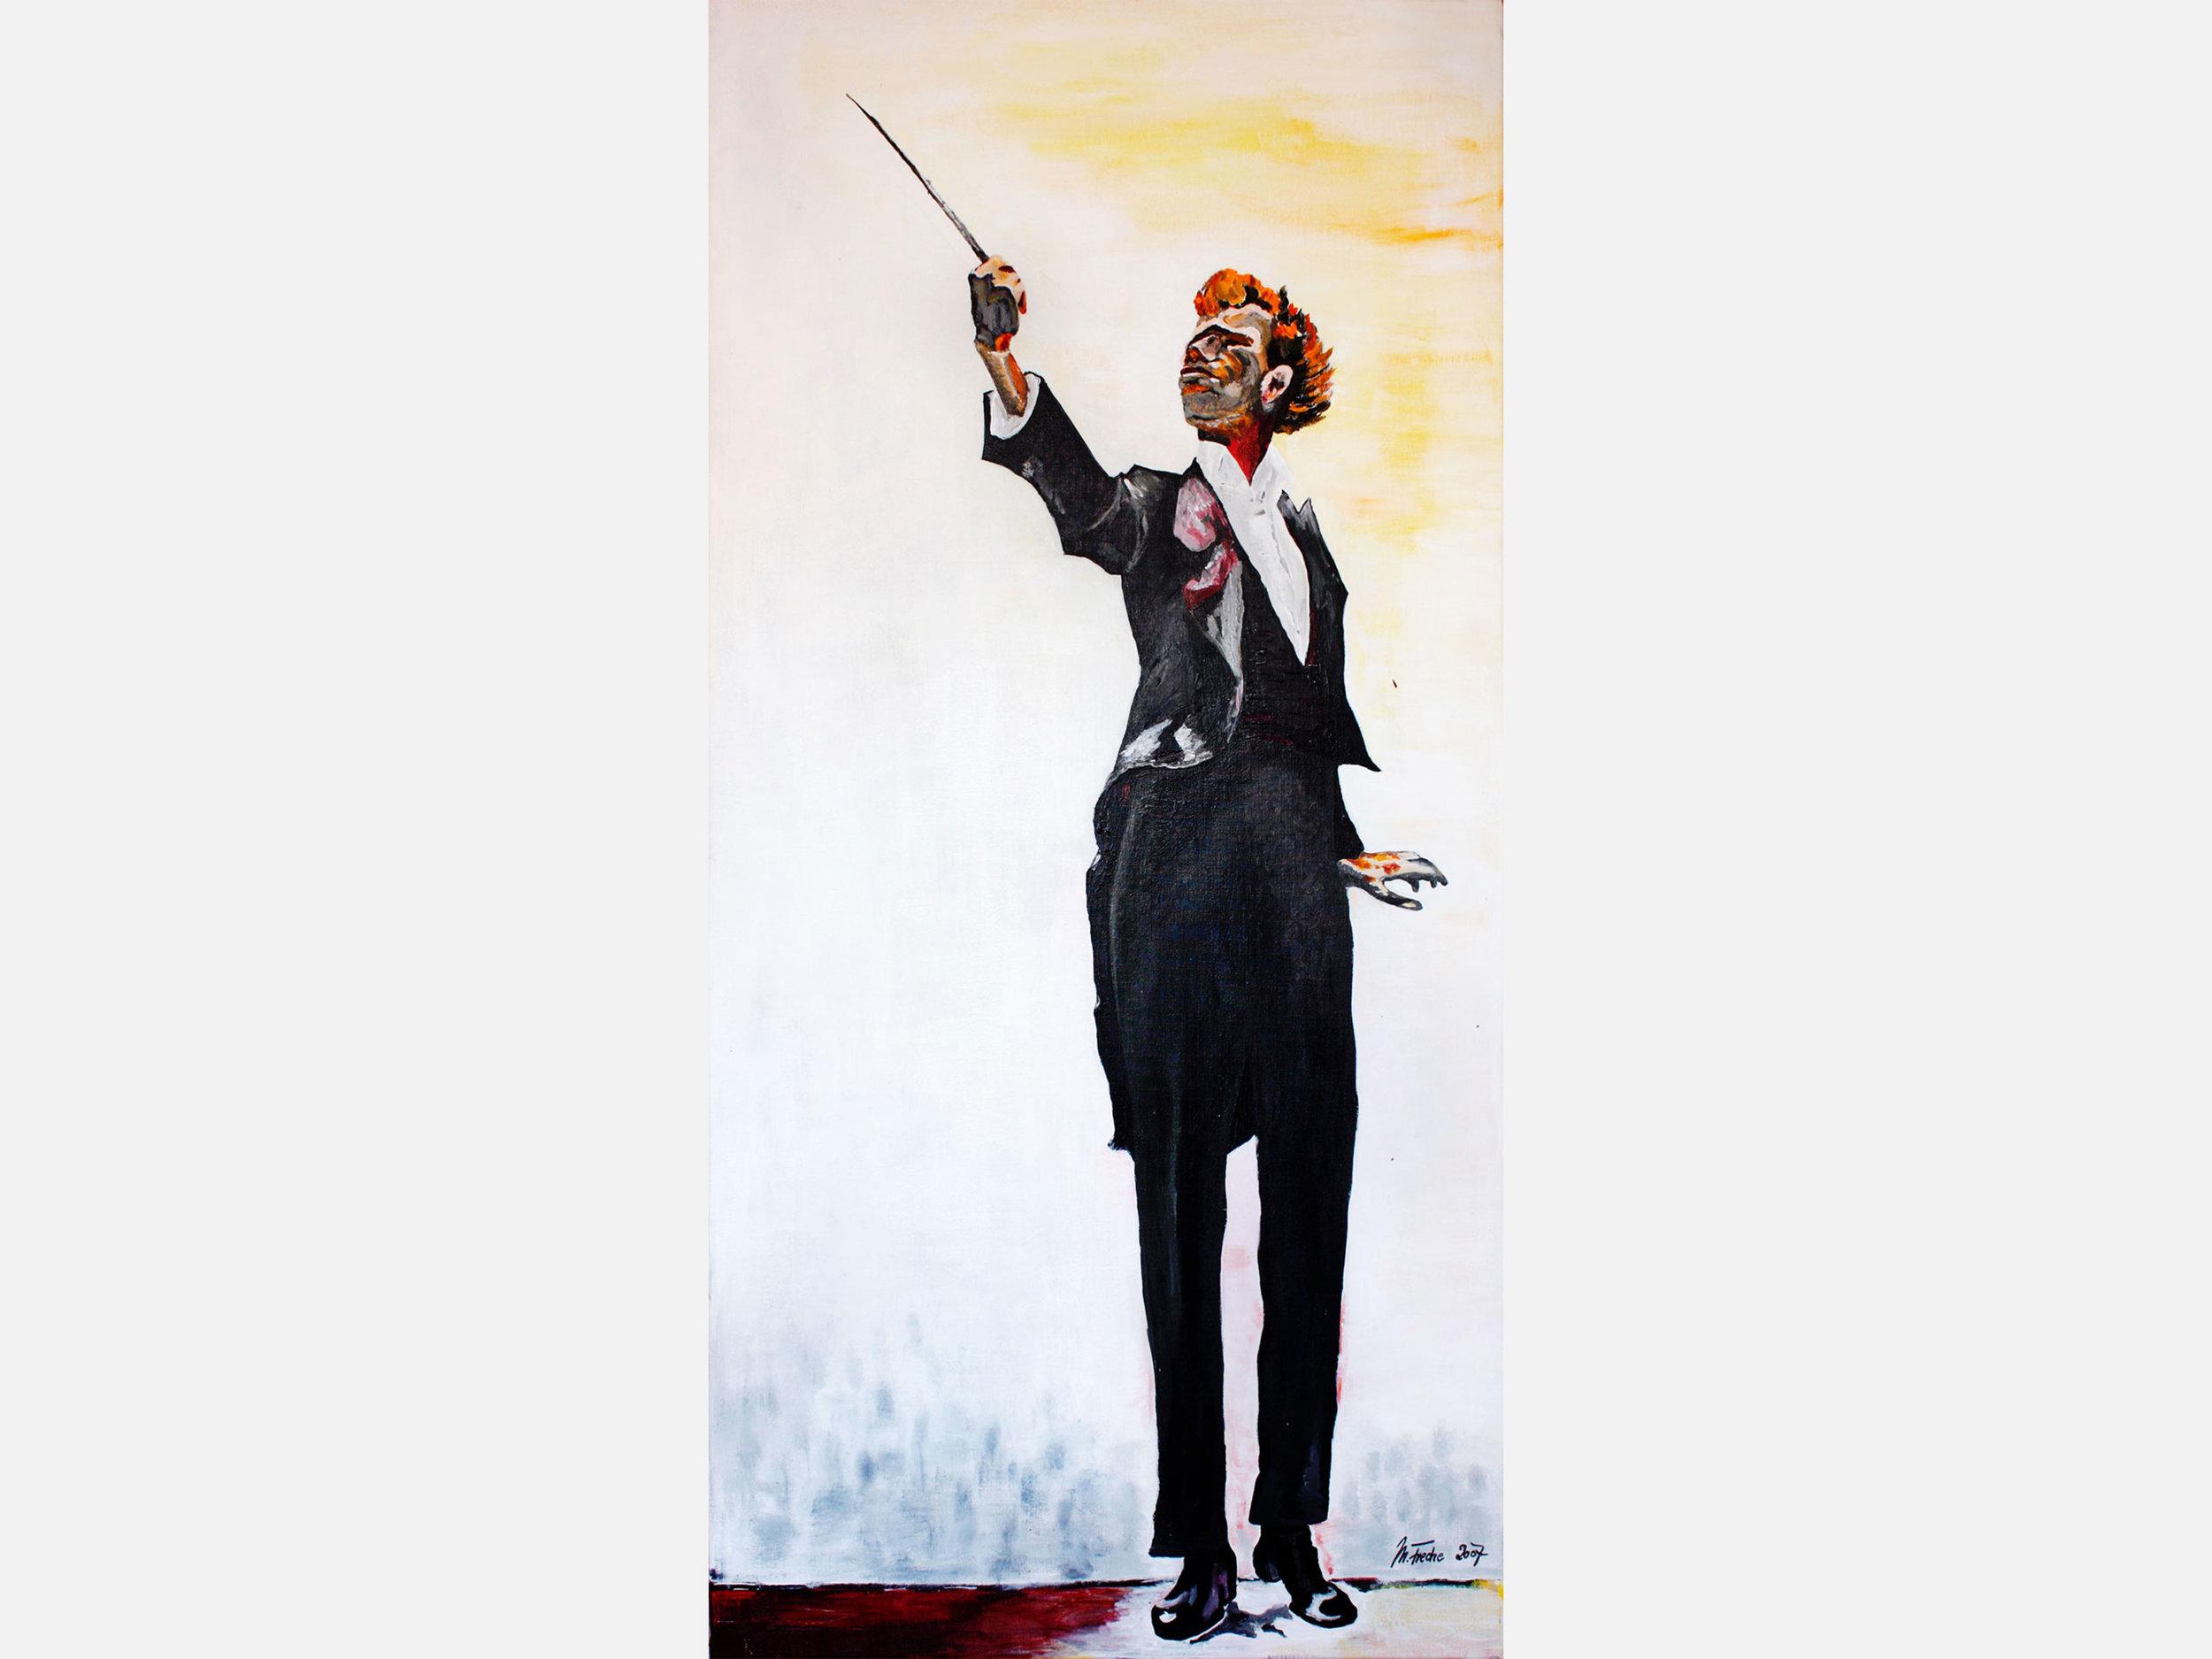 MF_Der-Dirigent_01.jpg